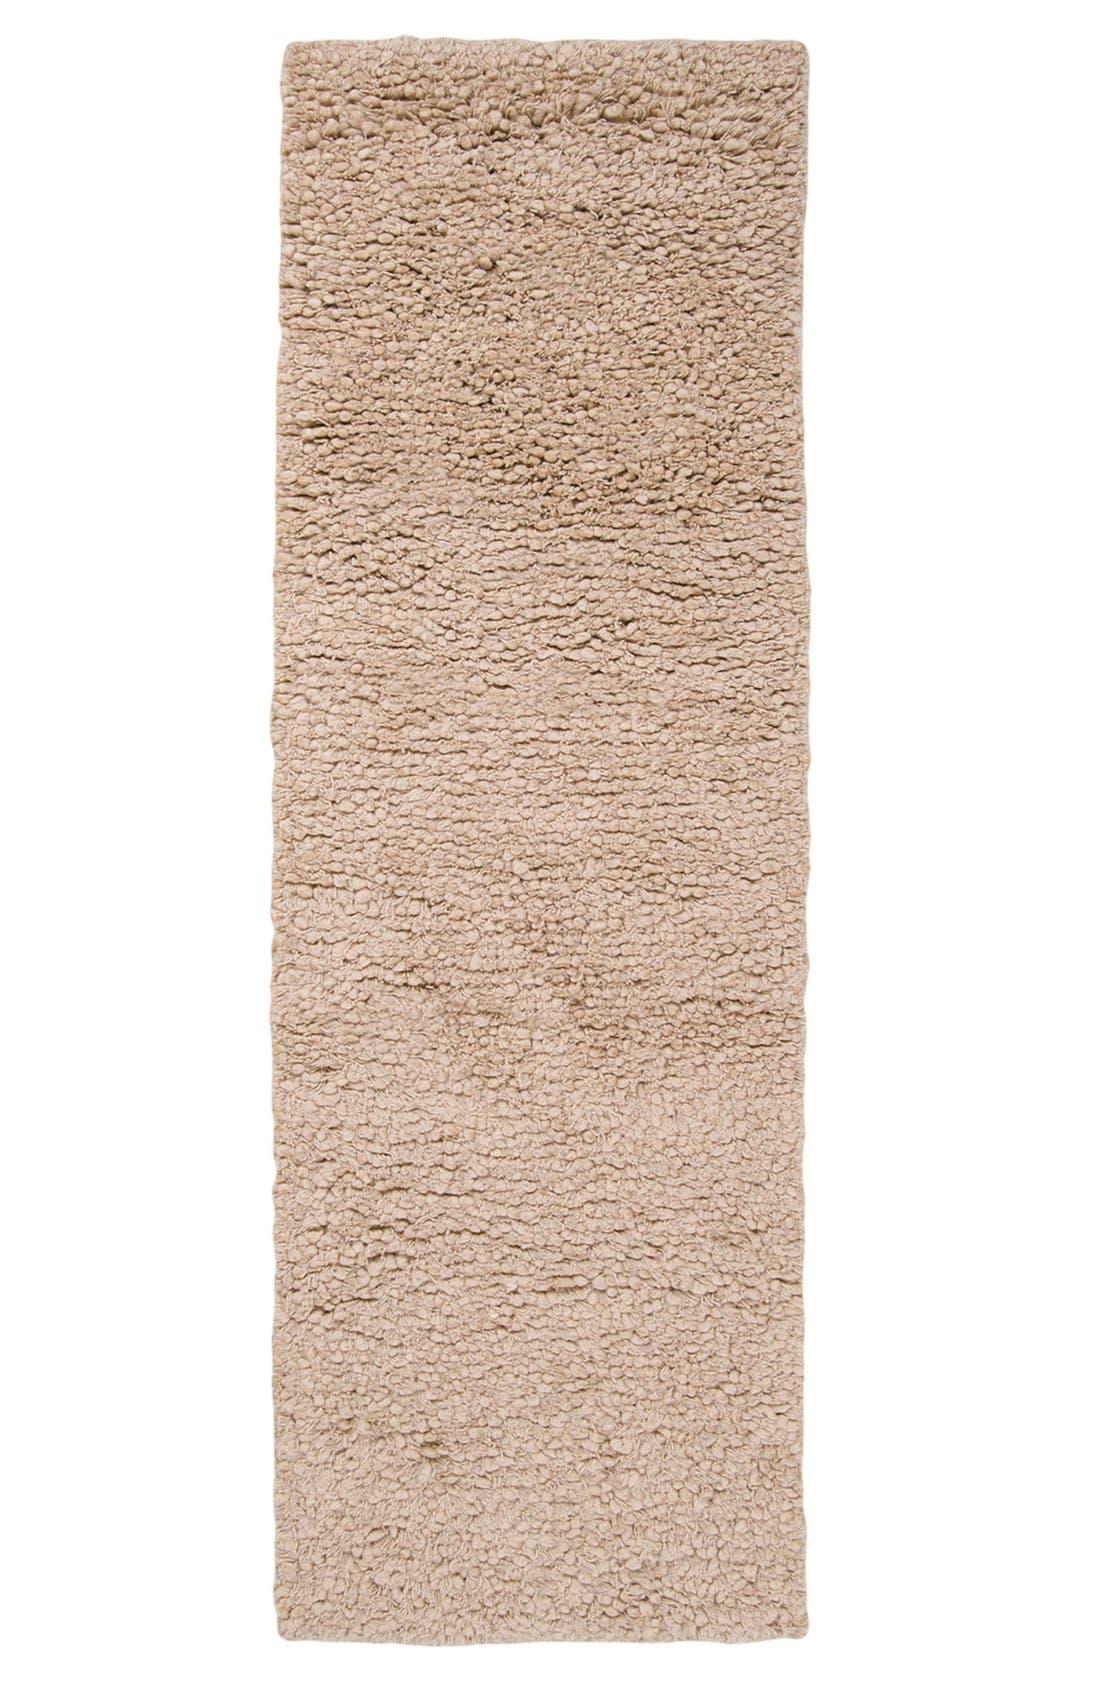 'Metropolitan' Wool Rug,                             Alternate thumbnail 2, color,                             250